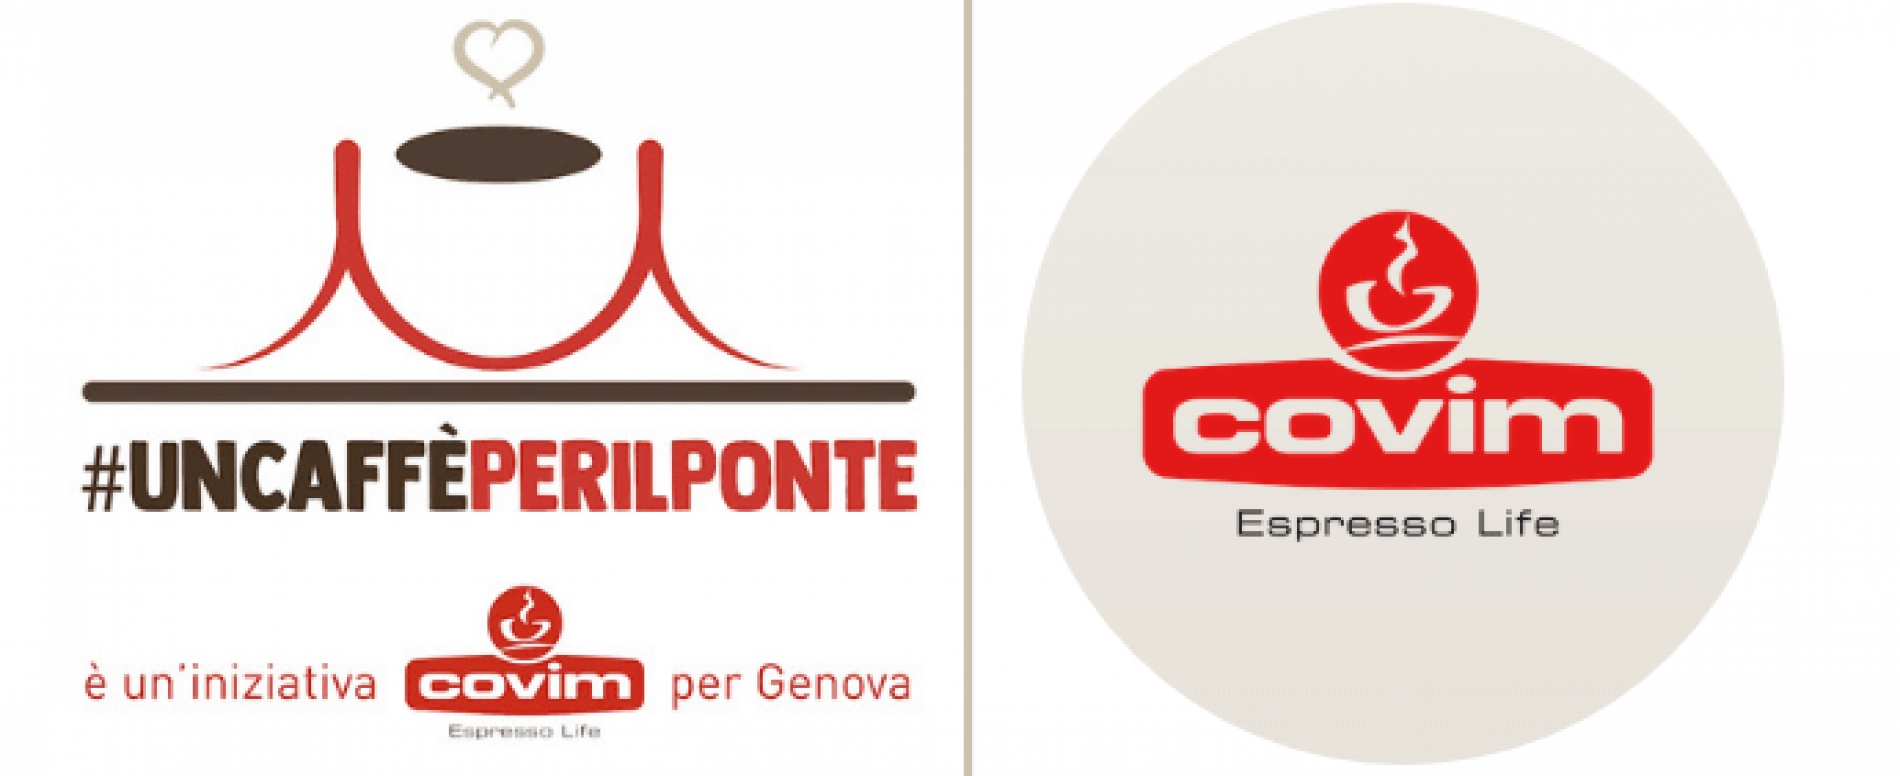 COVIM promuove per Genova l'iniziativa #UNCAFFÈPERILPONTE